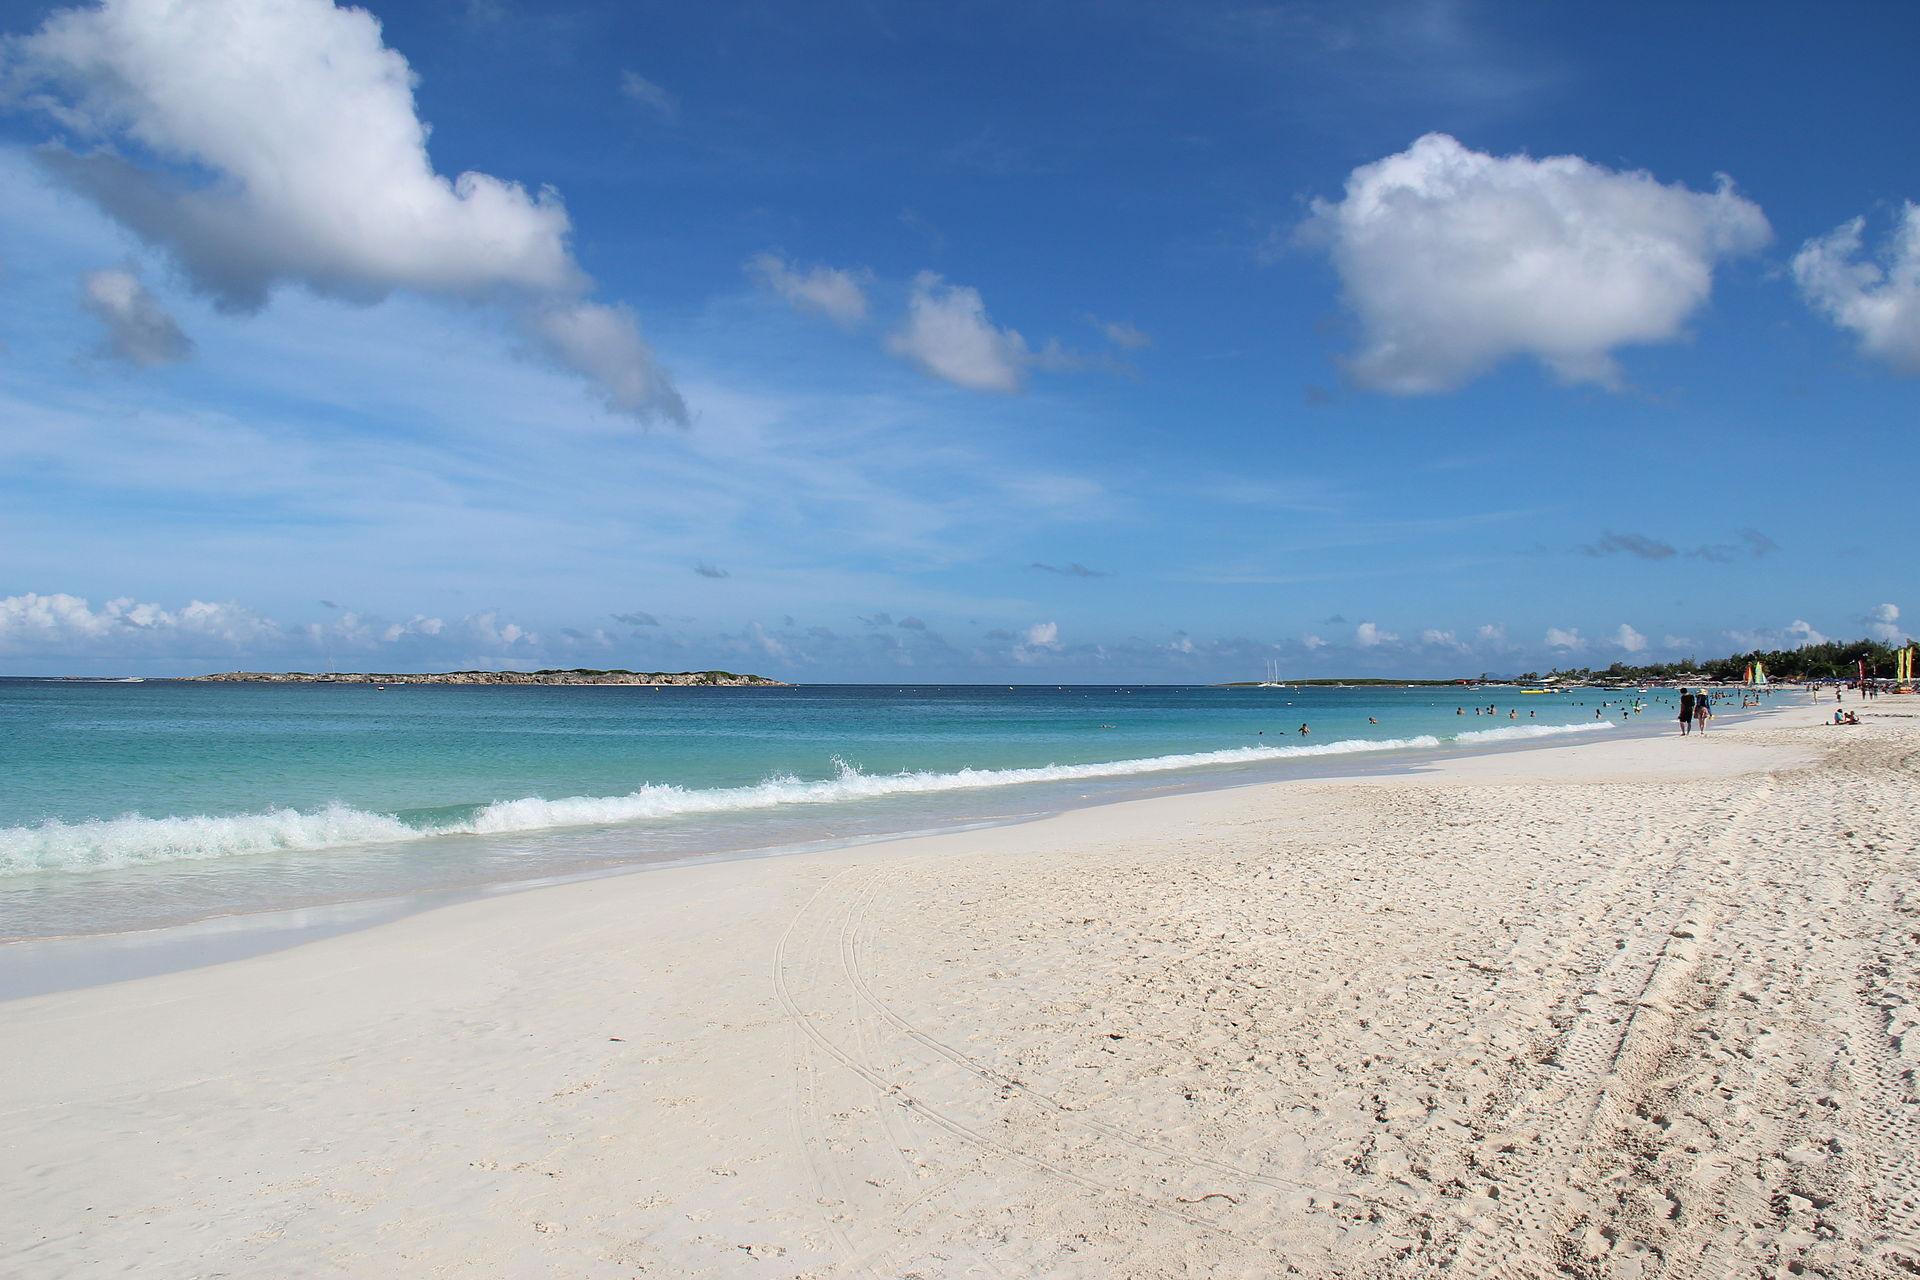 Orient bay beach - Plage de la baie orientale - Saint Martin / Sint Marteen / SXM